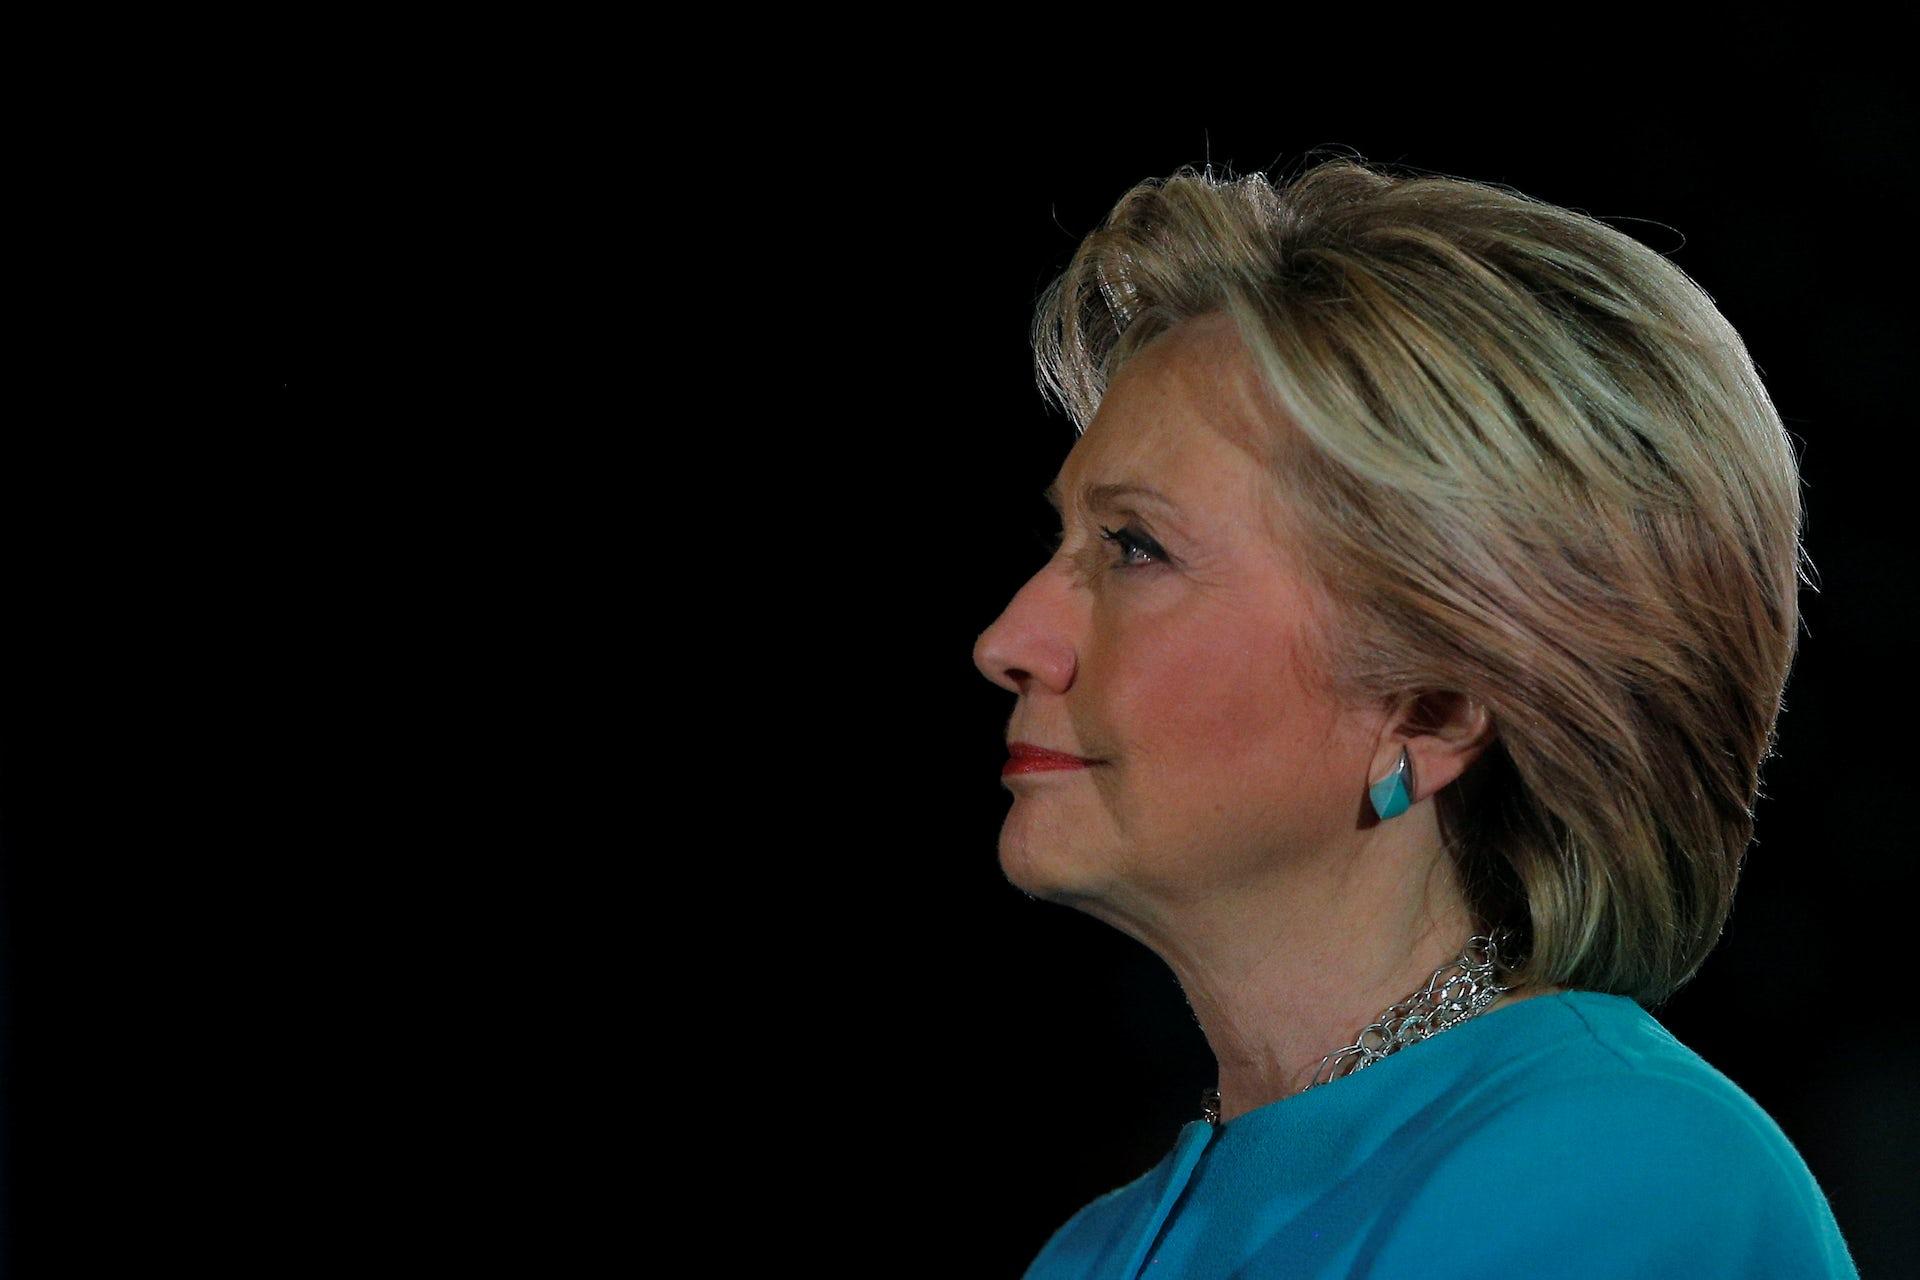 R. B. Hillary